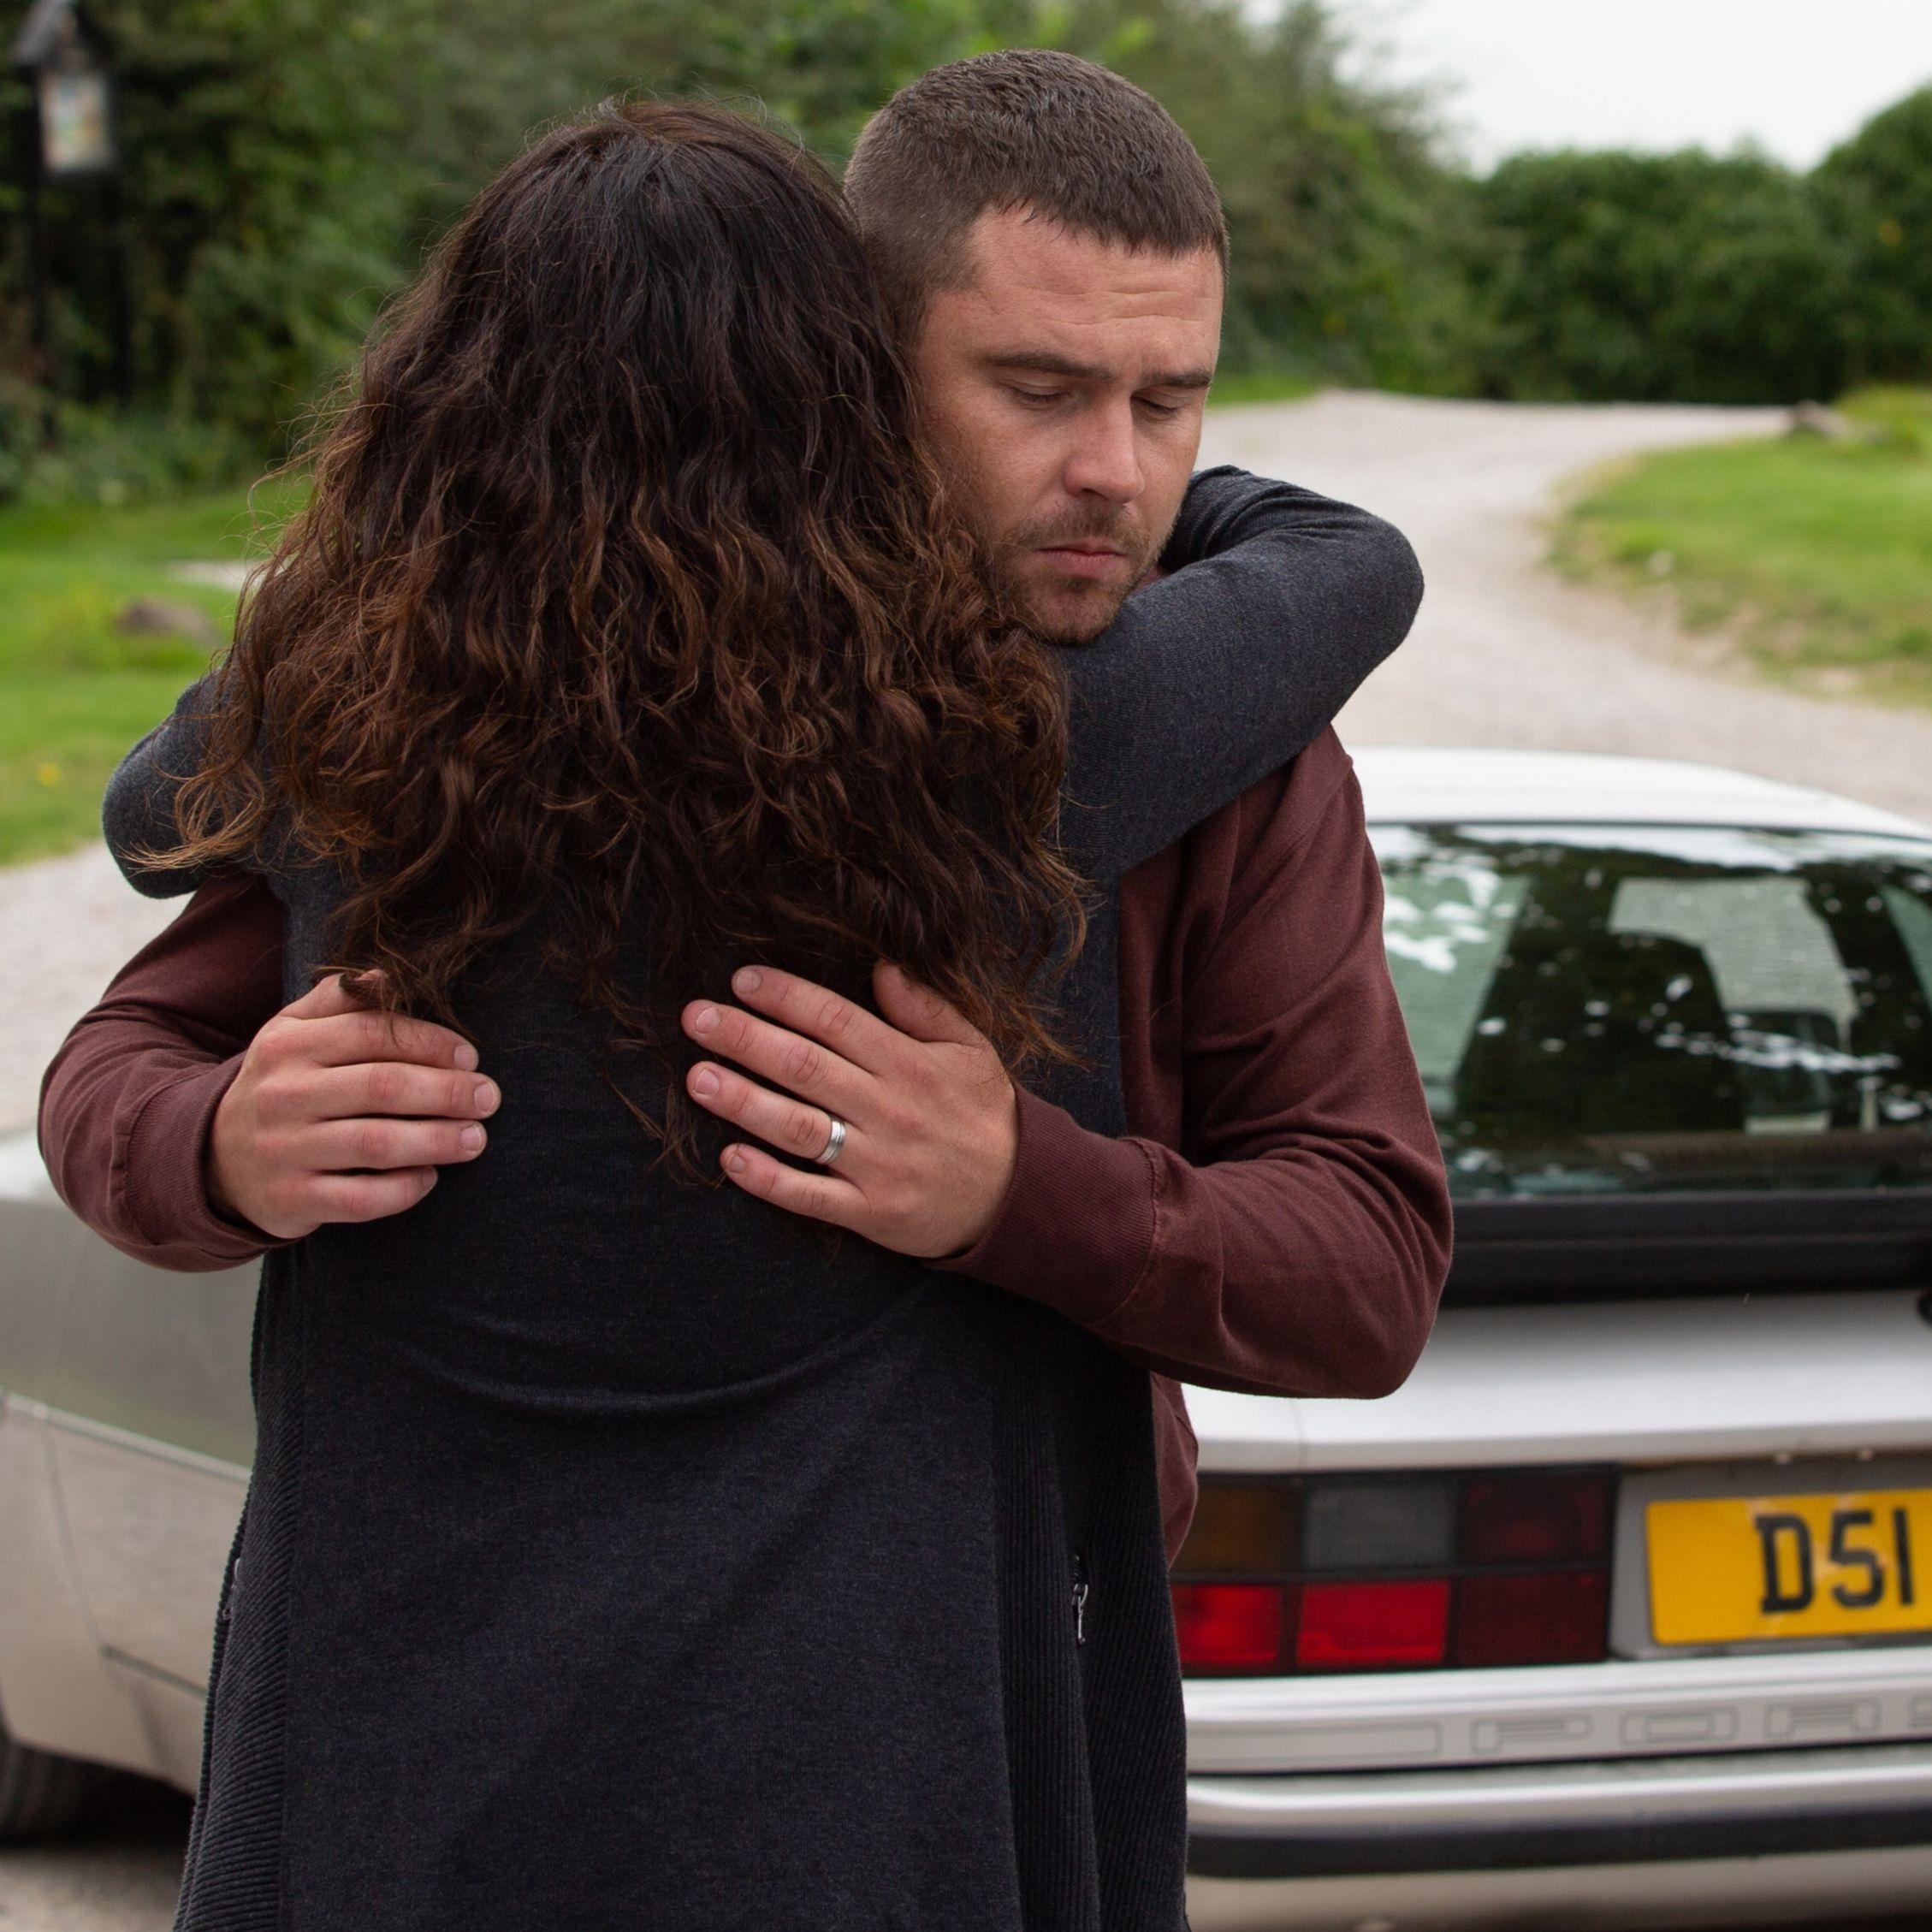 Emmerdale boss reveals Aaron Dingle's future after Robert's exit